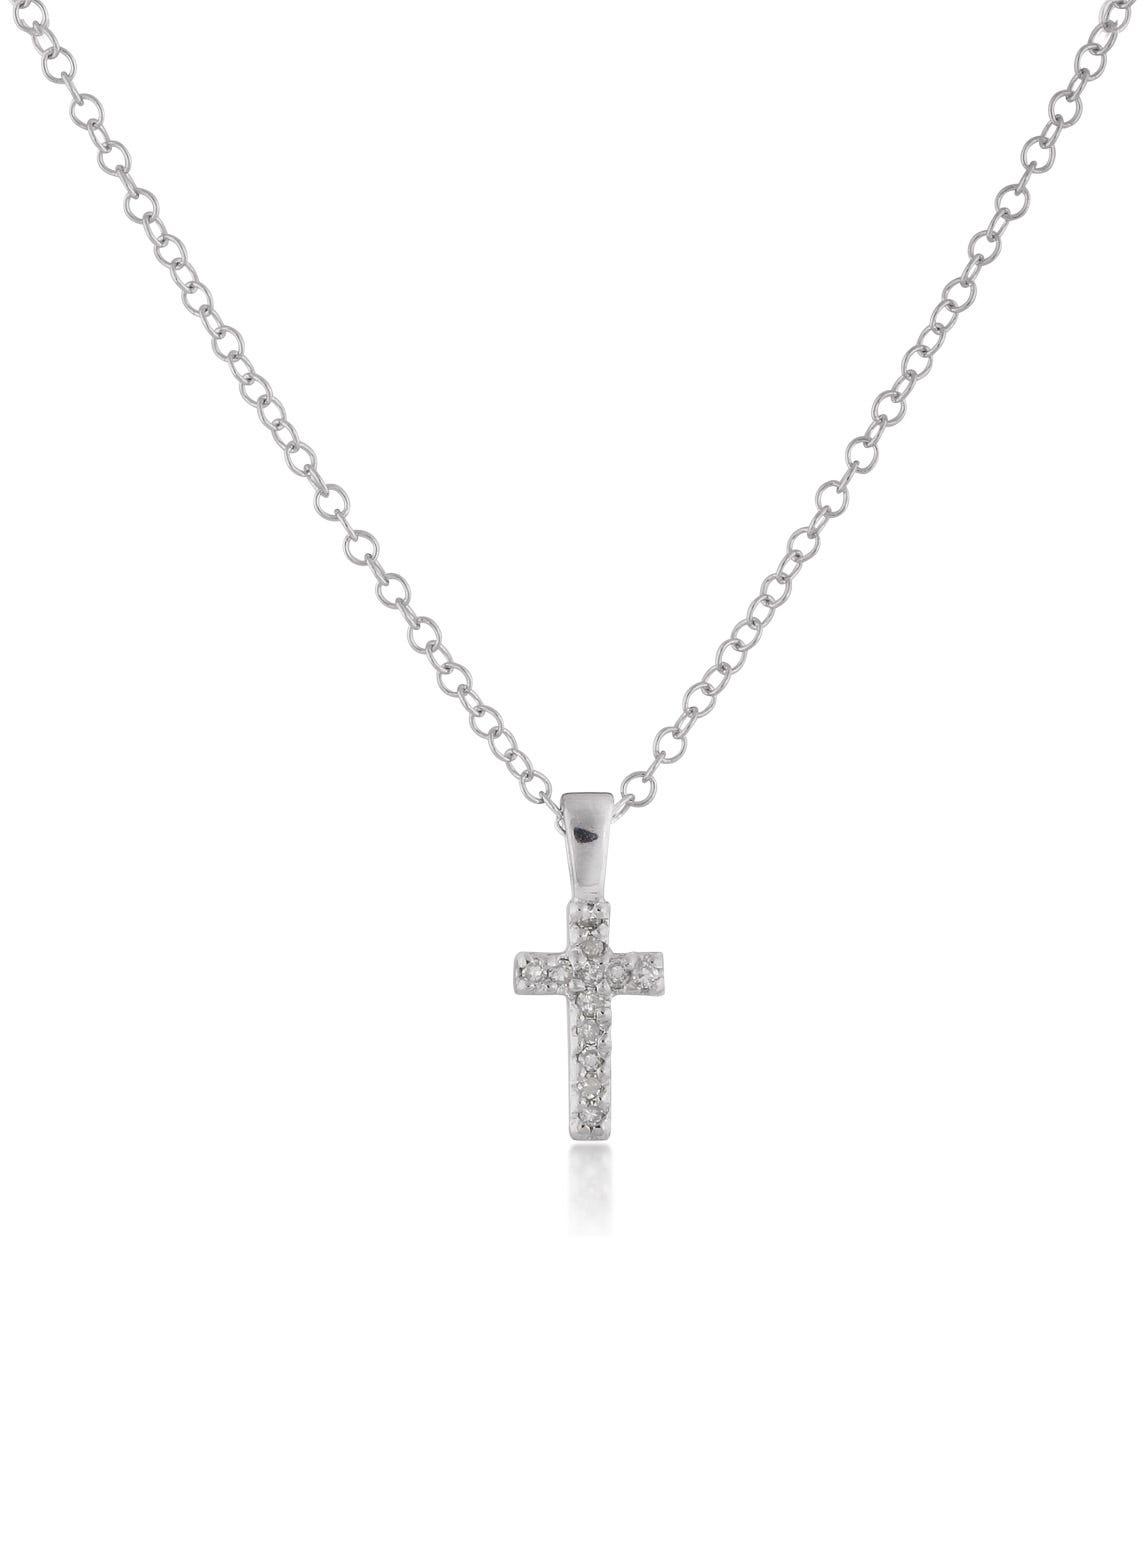 Diamond Cross Pendant Children's Necklace in Sterling Silver 15